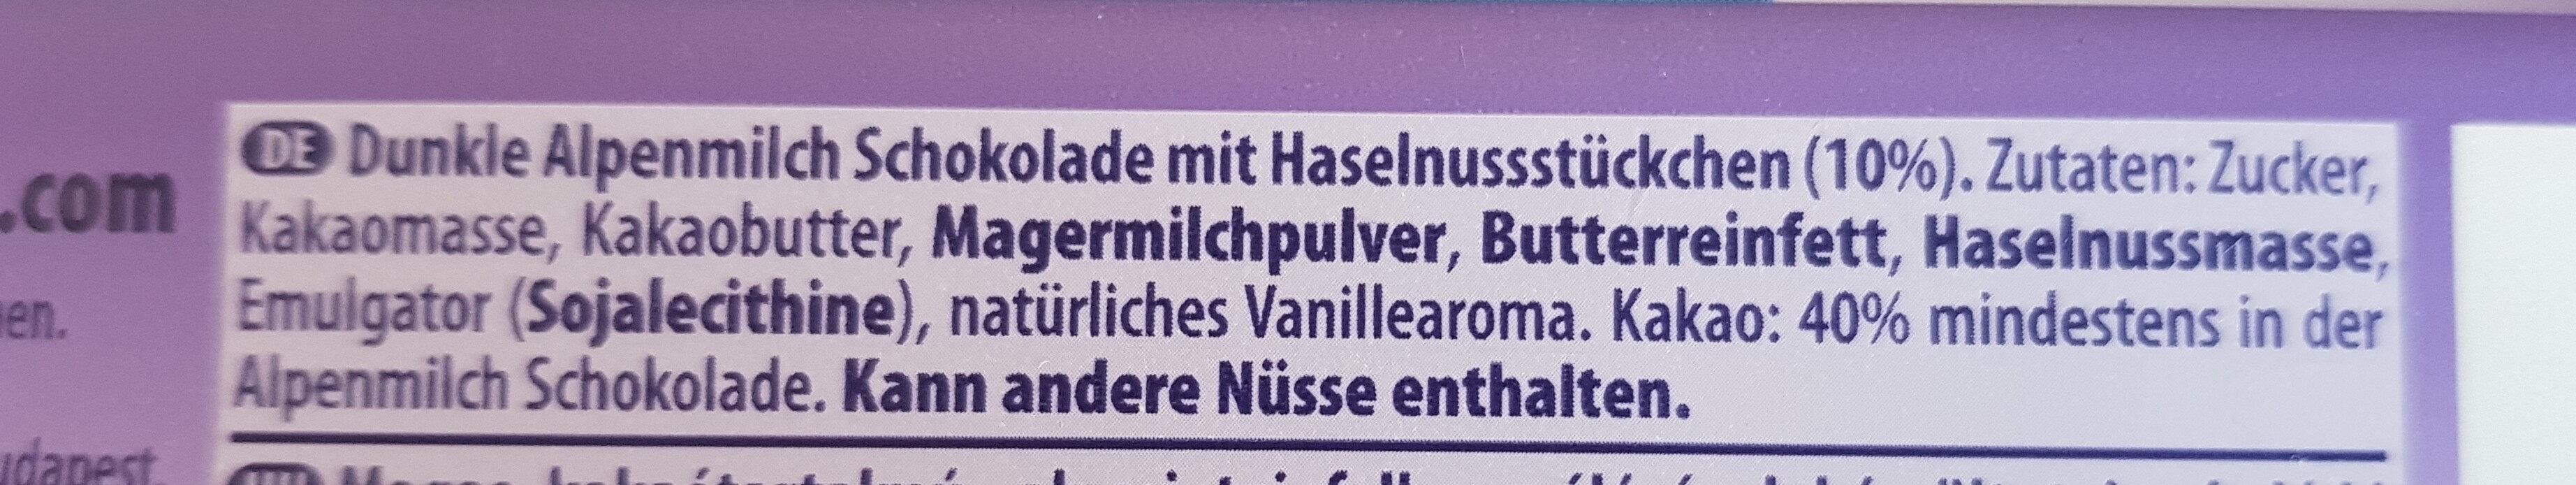 Darkmilk Haselnuss - Zutaten - de